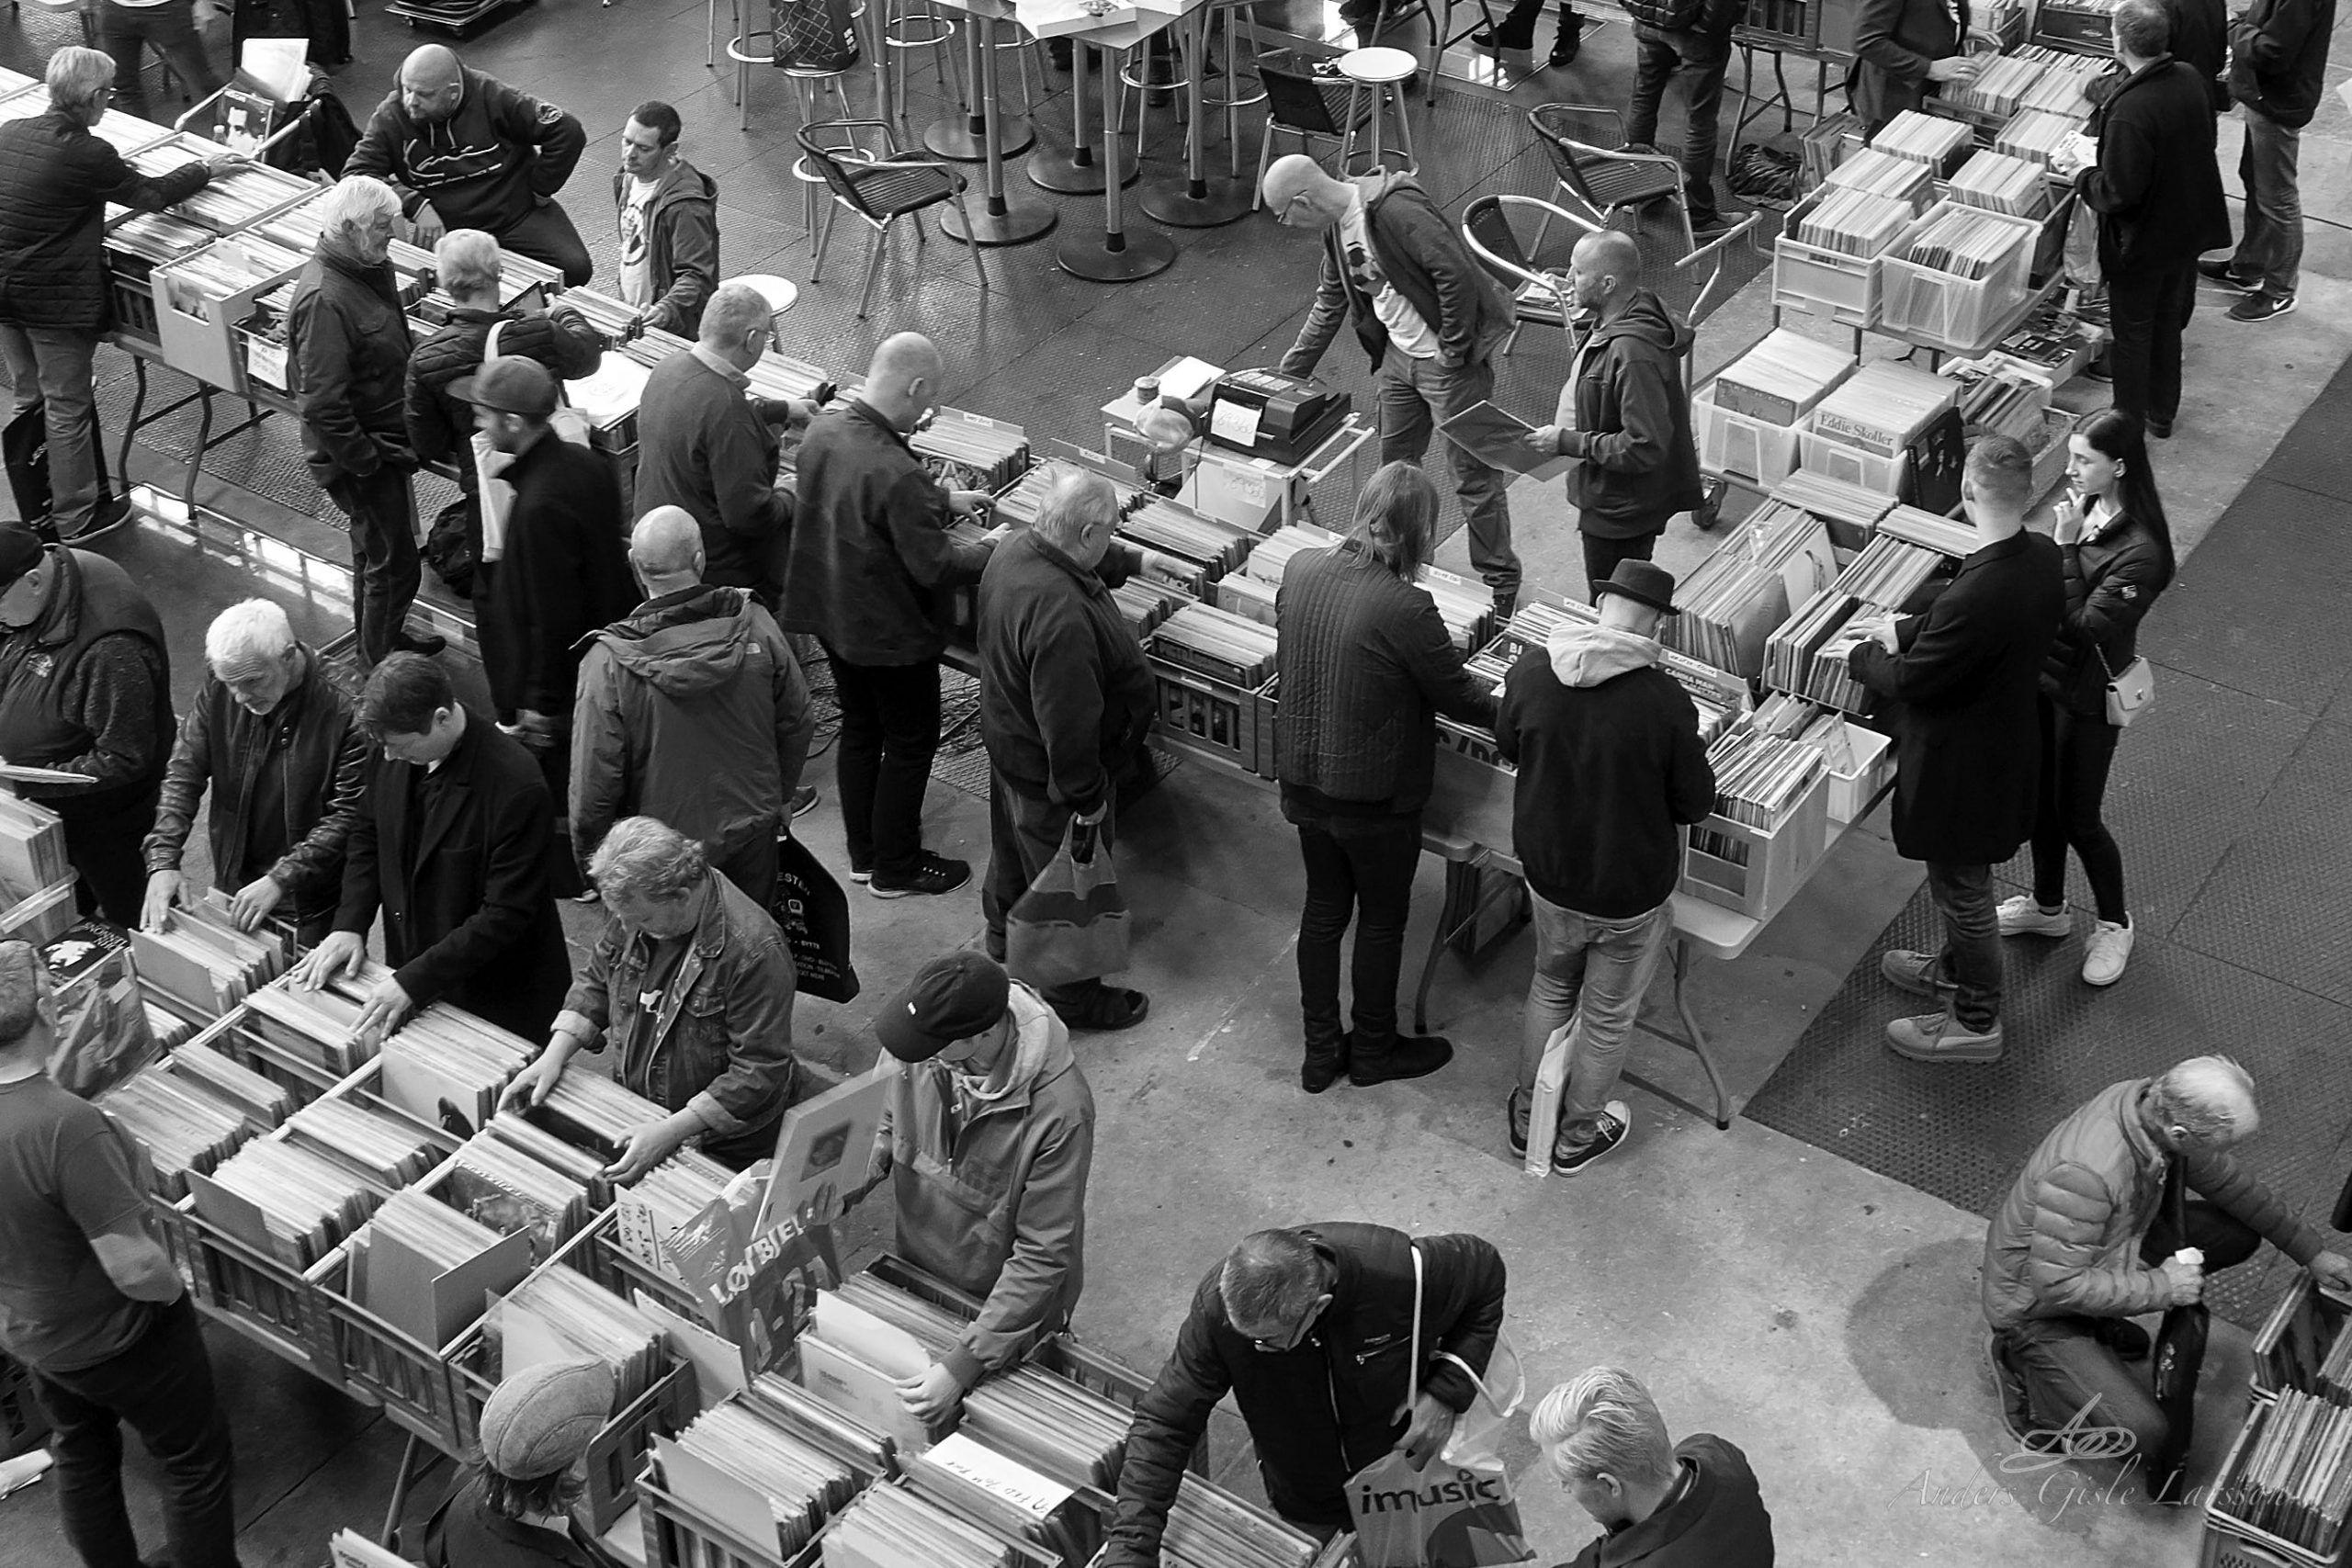 Vinyl hunt, 272/365, Uge 39, Nordkraft, Aalborg